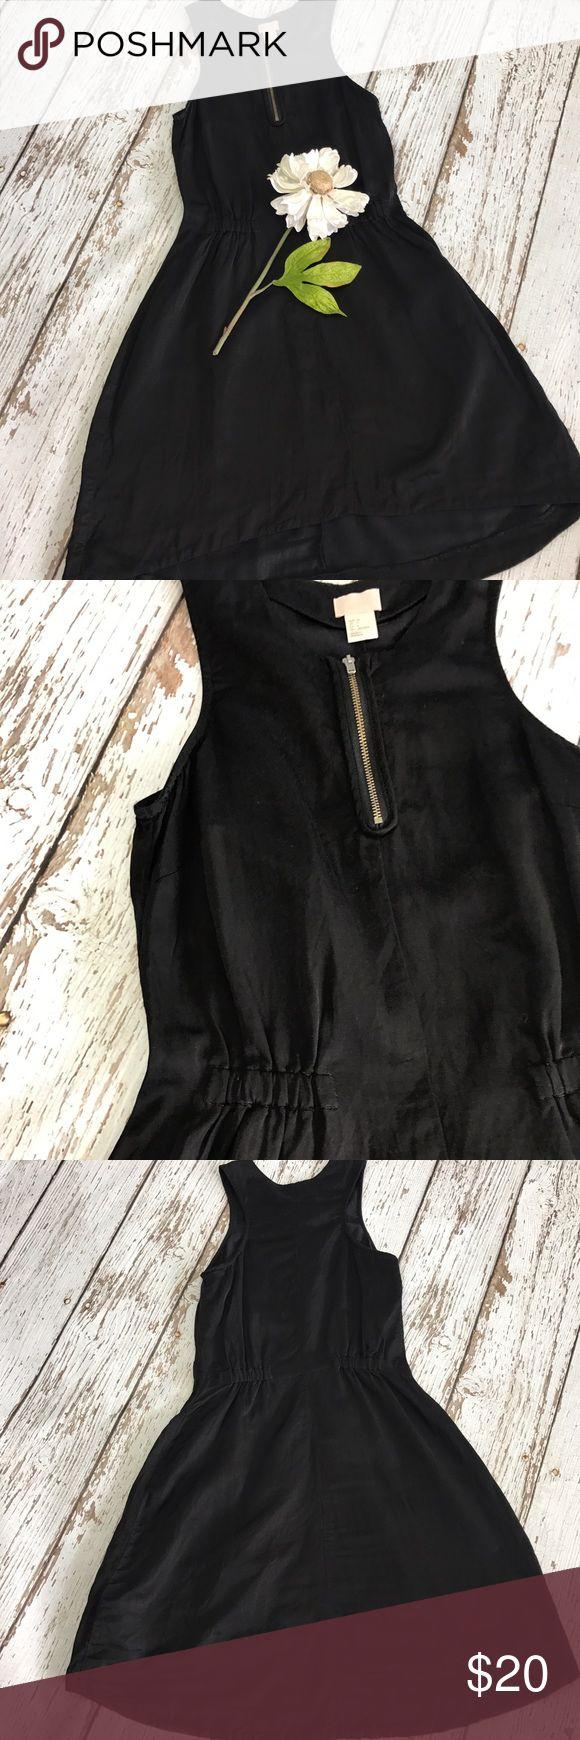 e6bf871423e1 💕SALE💕 H M Black Linen Blend Hi Low Dress